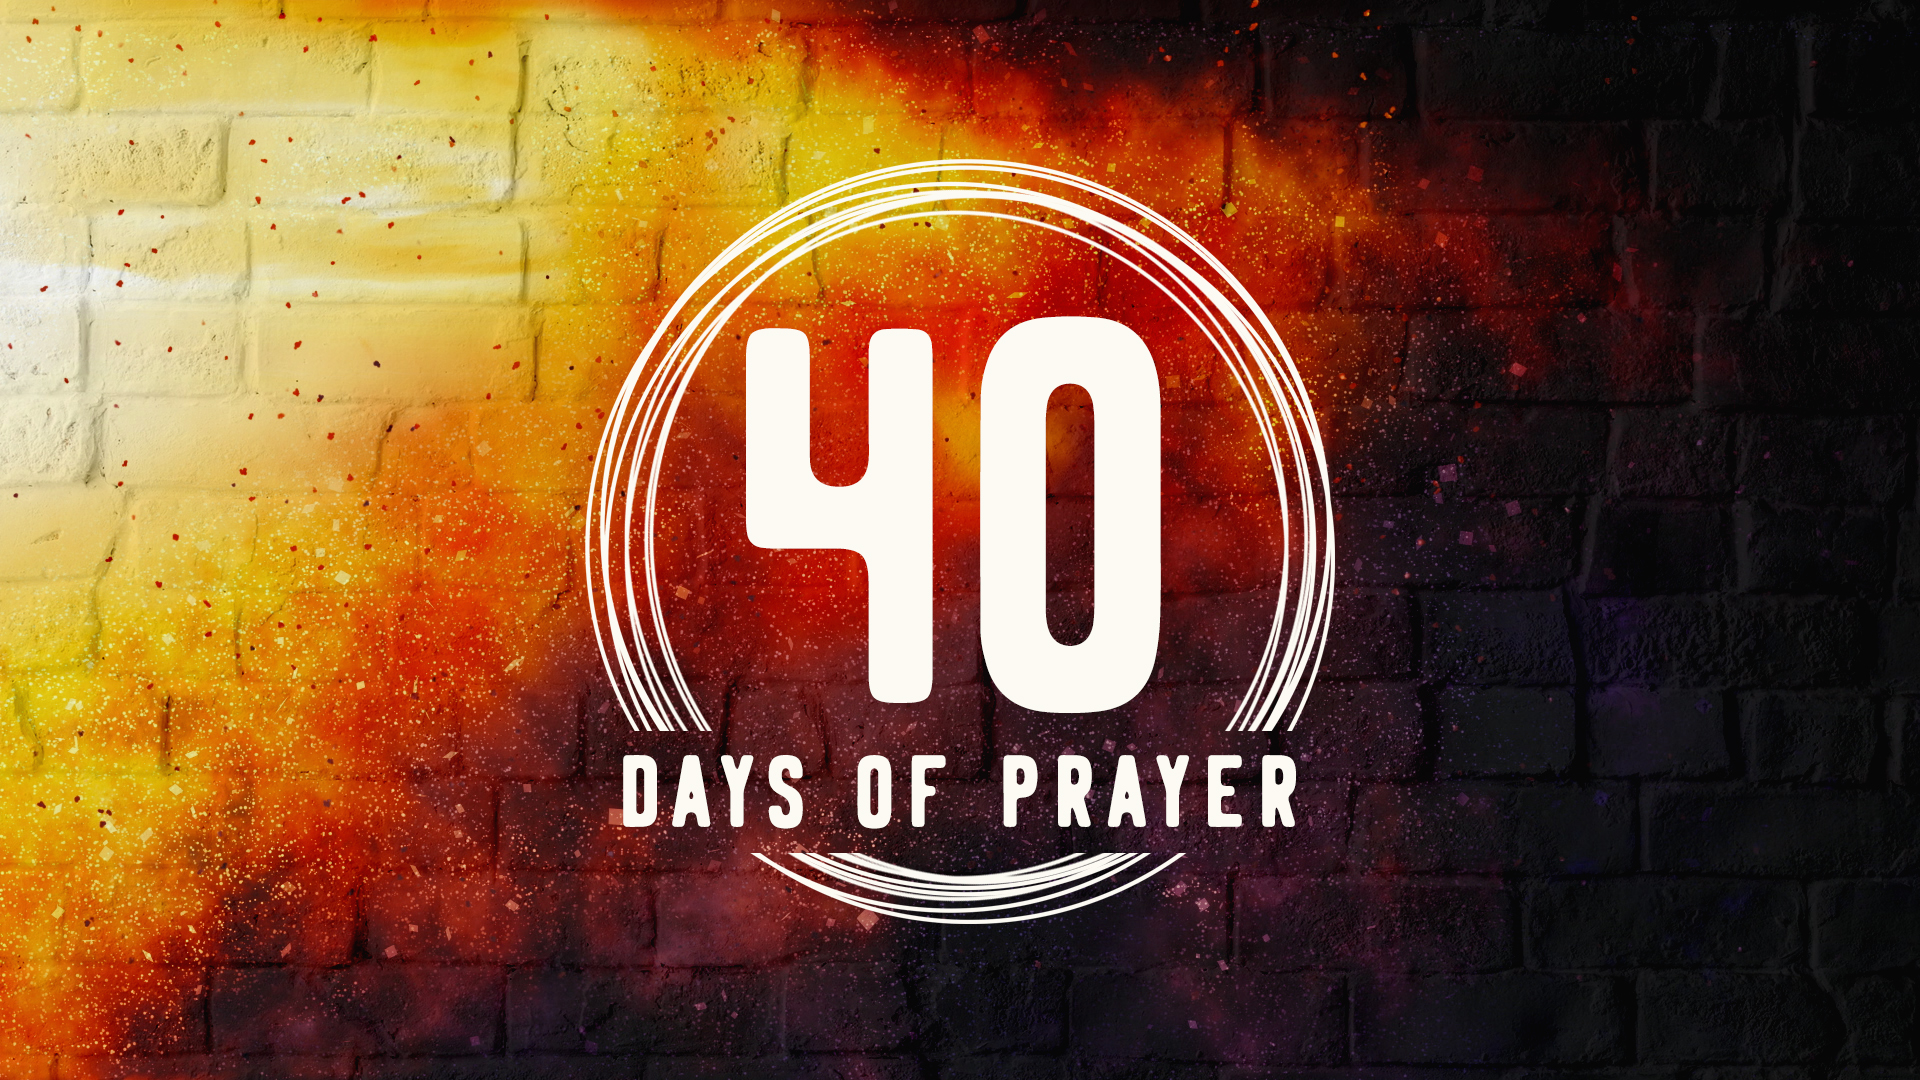 40 Days of Prayer_1920x1080.jpg